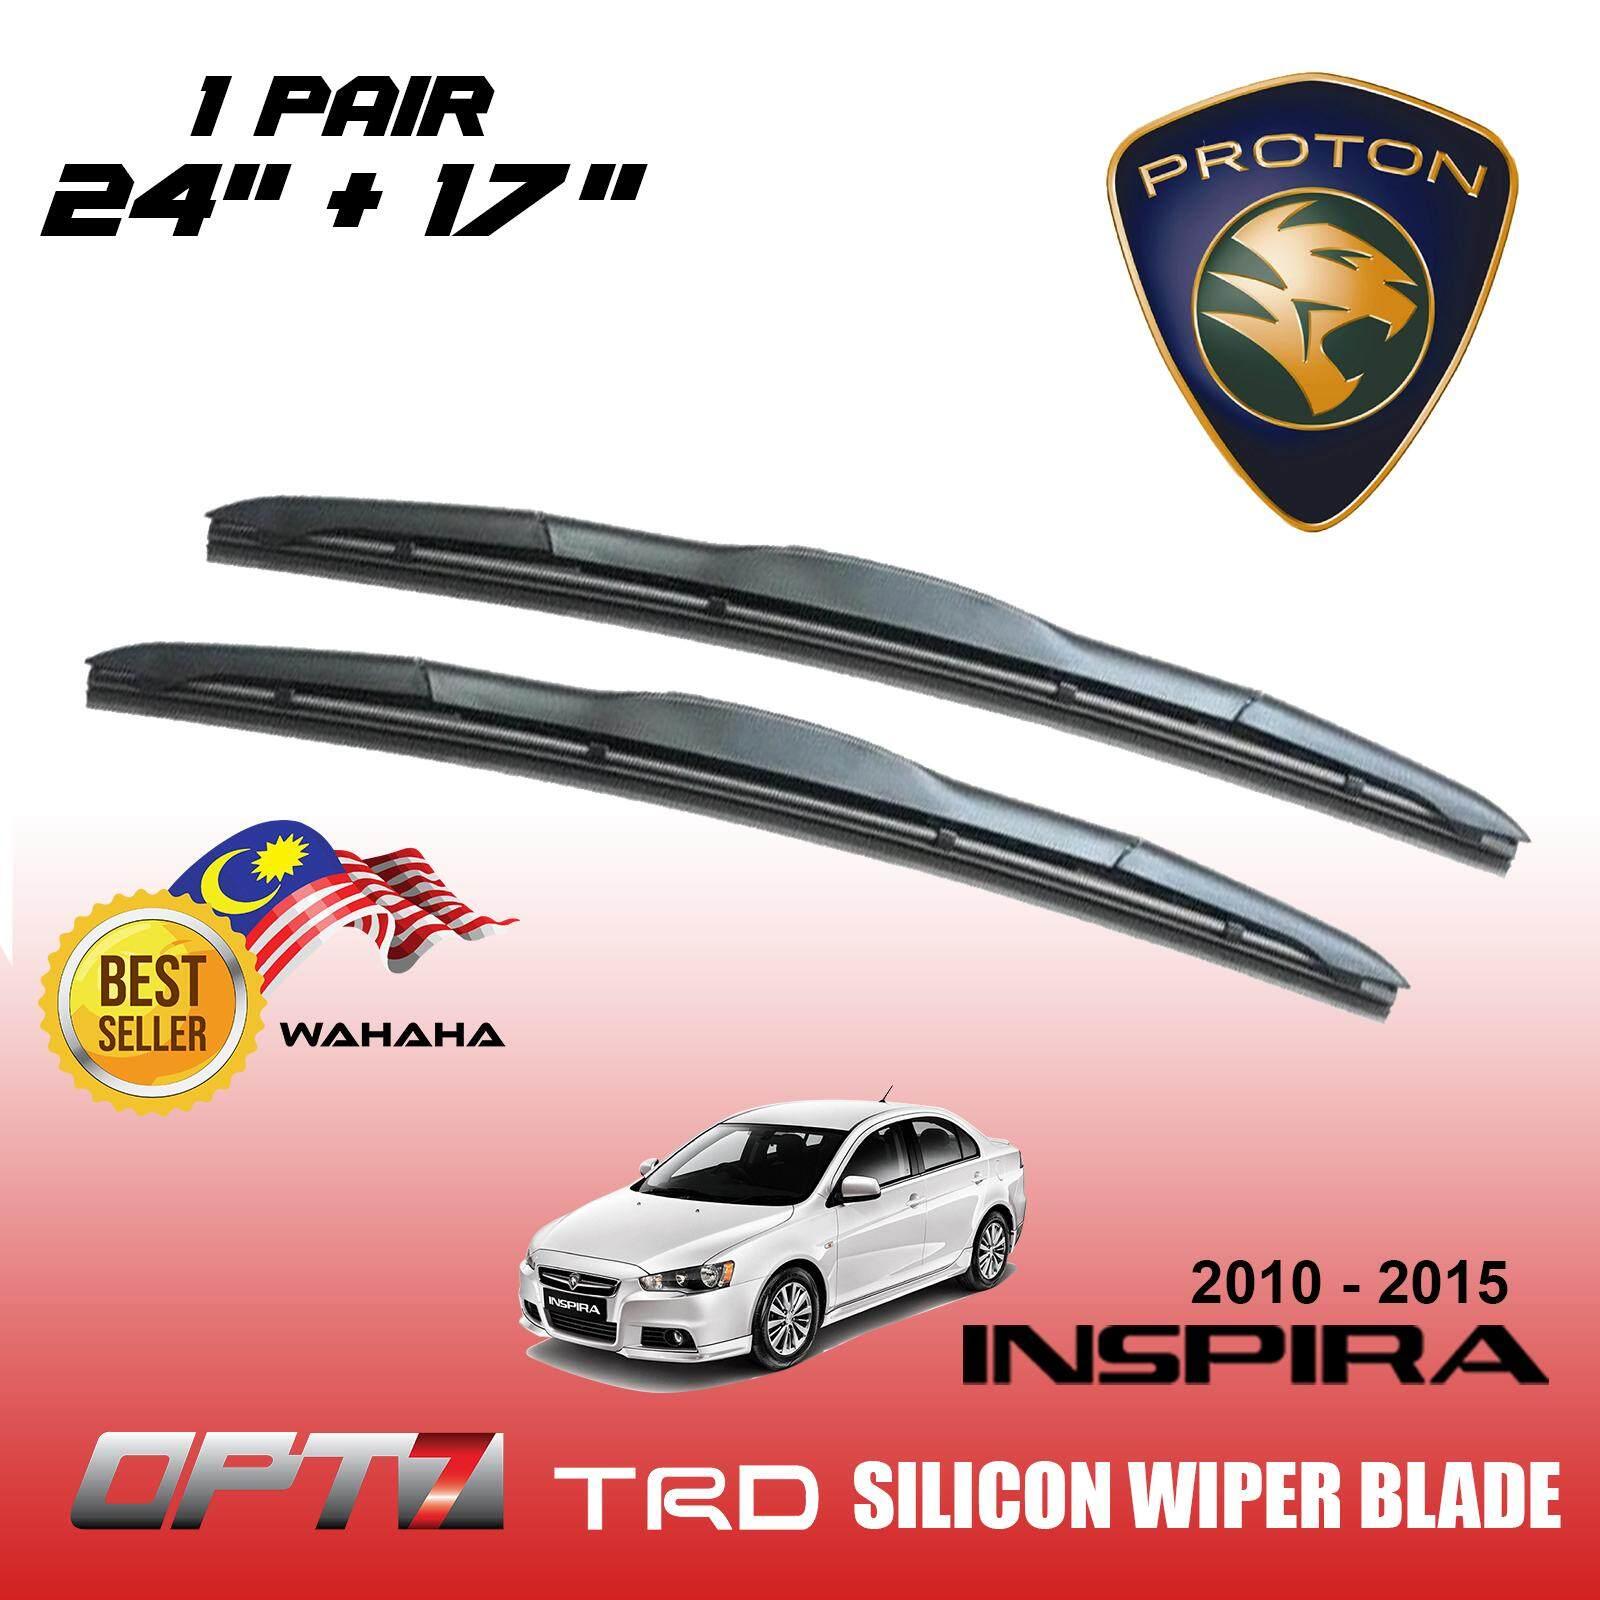 Proton Inspira 2010-2015 U Shape OPT7 Window Windshield TRD Silicon Wiper Blade 24  + 17